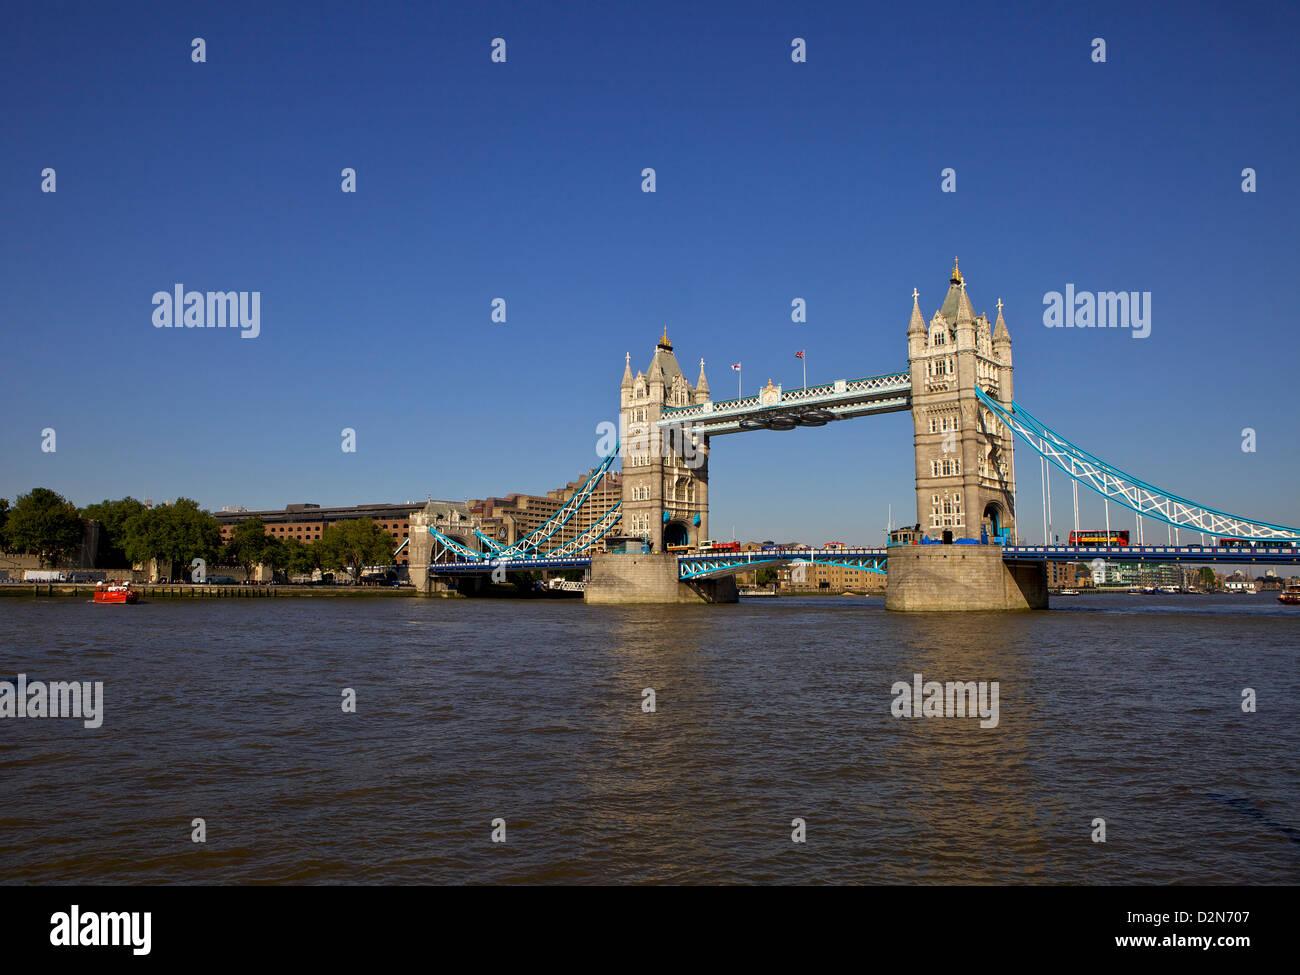 Tower Bridge and the River Thames, London, England United Kingdom, Europe - Stock Image